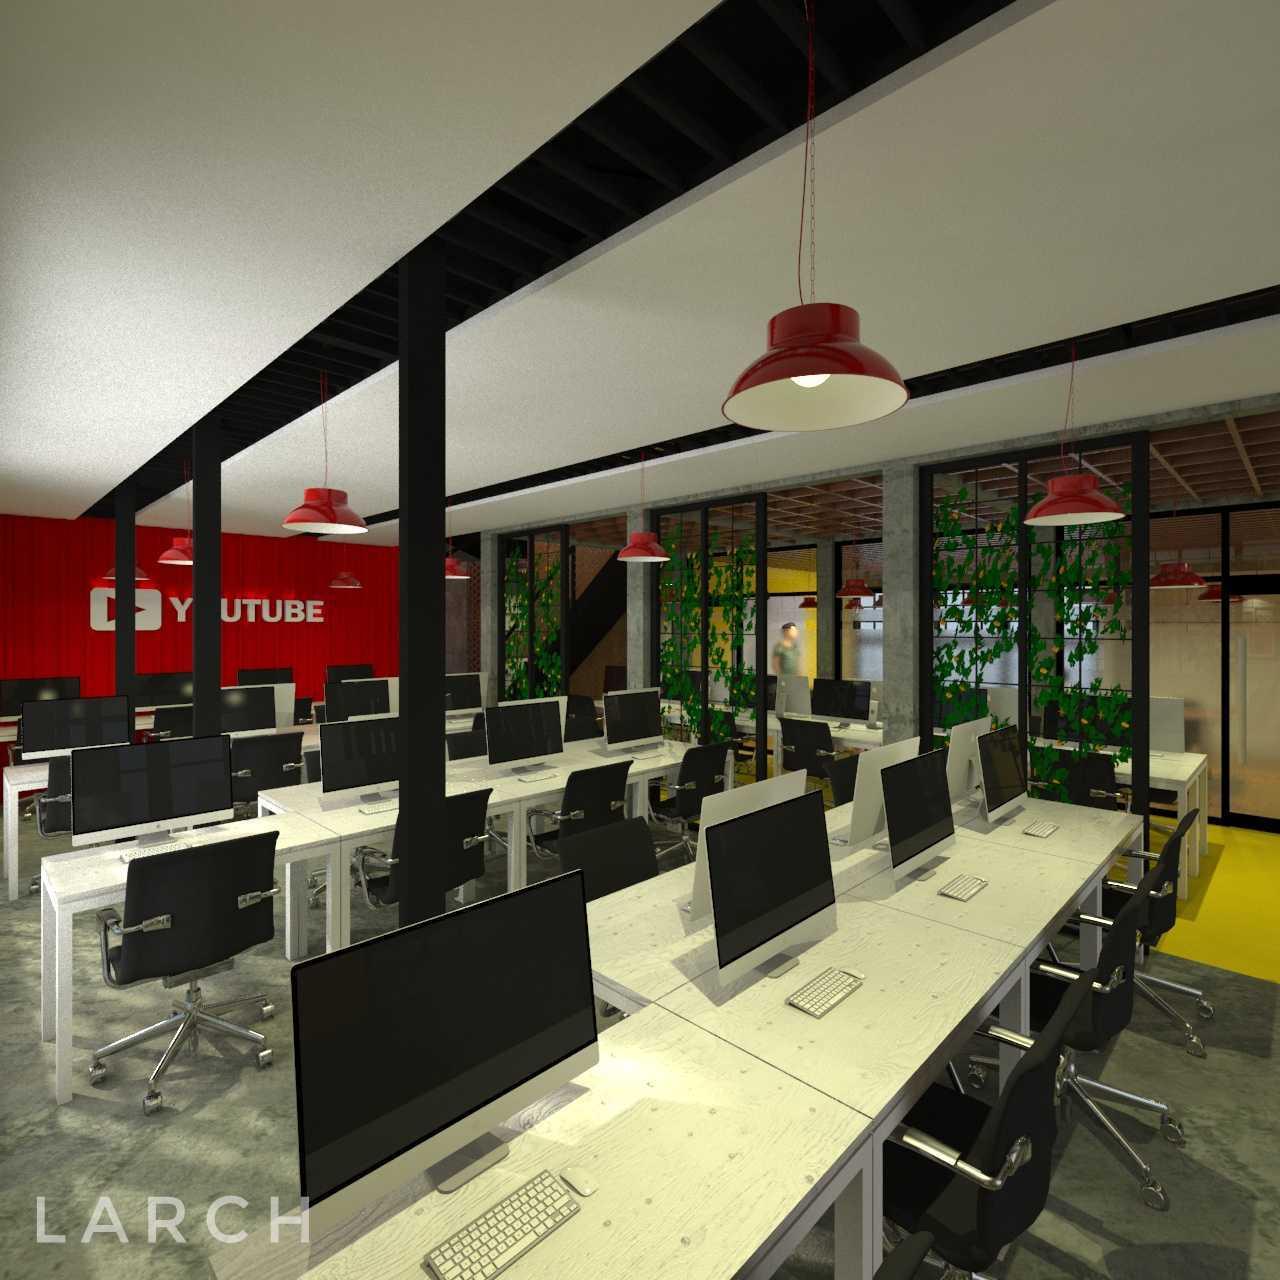 Larch Architecture Team Kantor Herbaltv Tasikmalaya, Jawa Barat, Indonesia Tasikmalaya, Jawa Barat, Indonesia Larch-Architecture-Team-Kantor-Herbaltv  67045